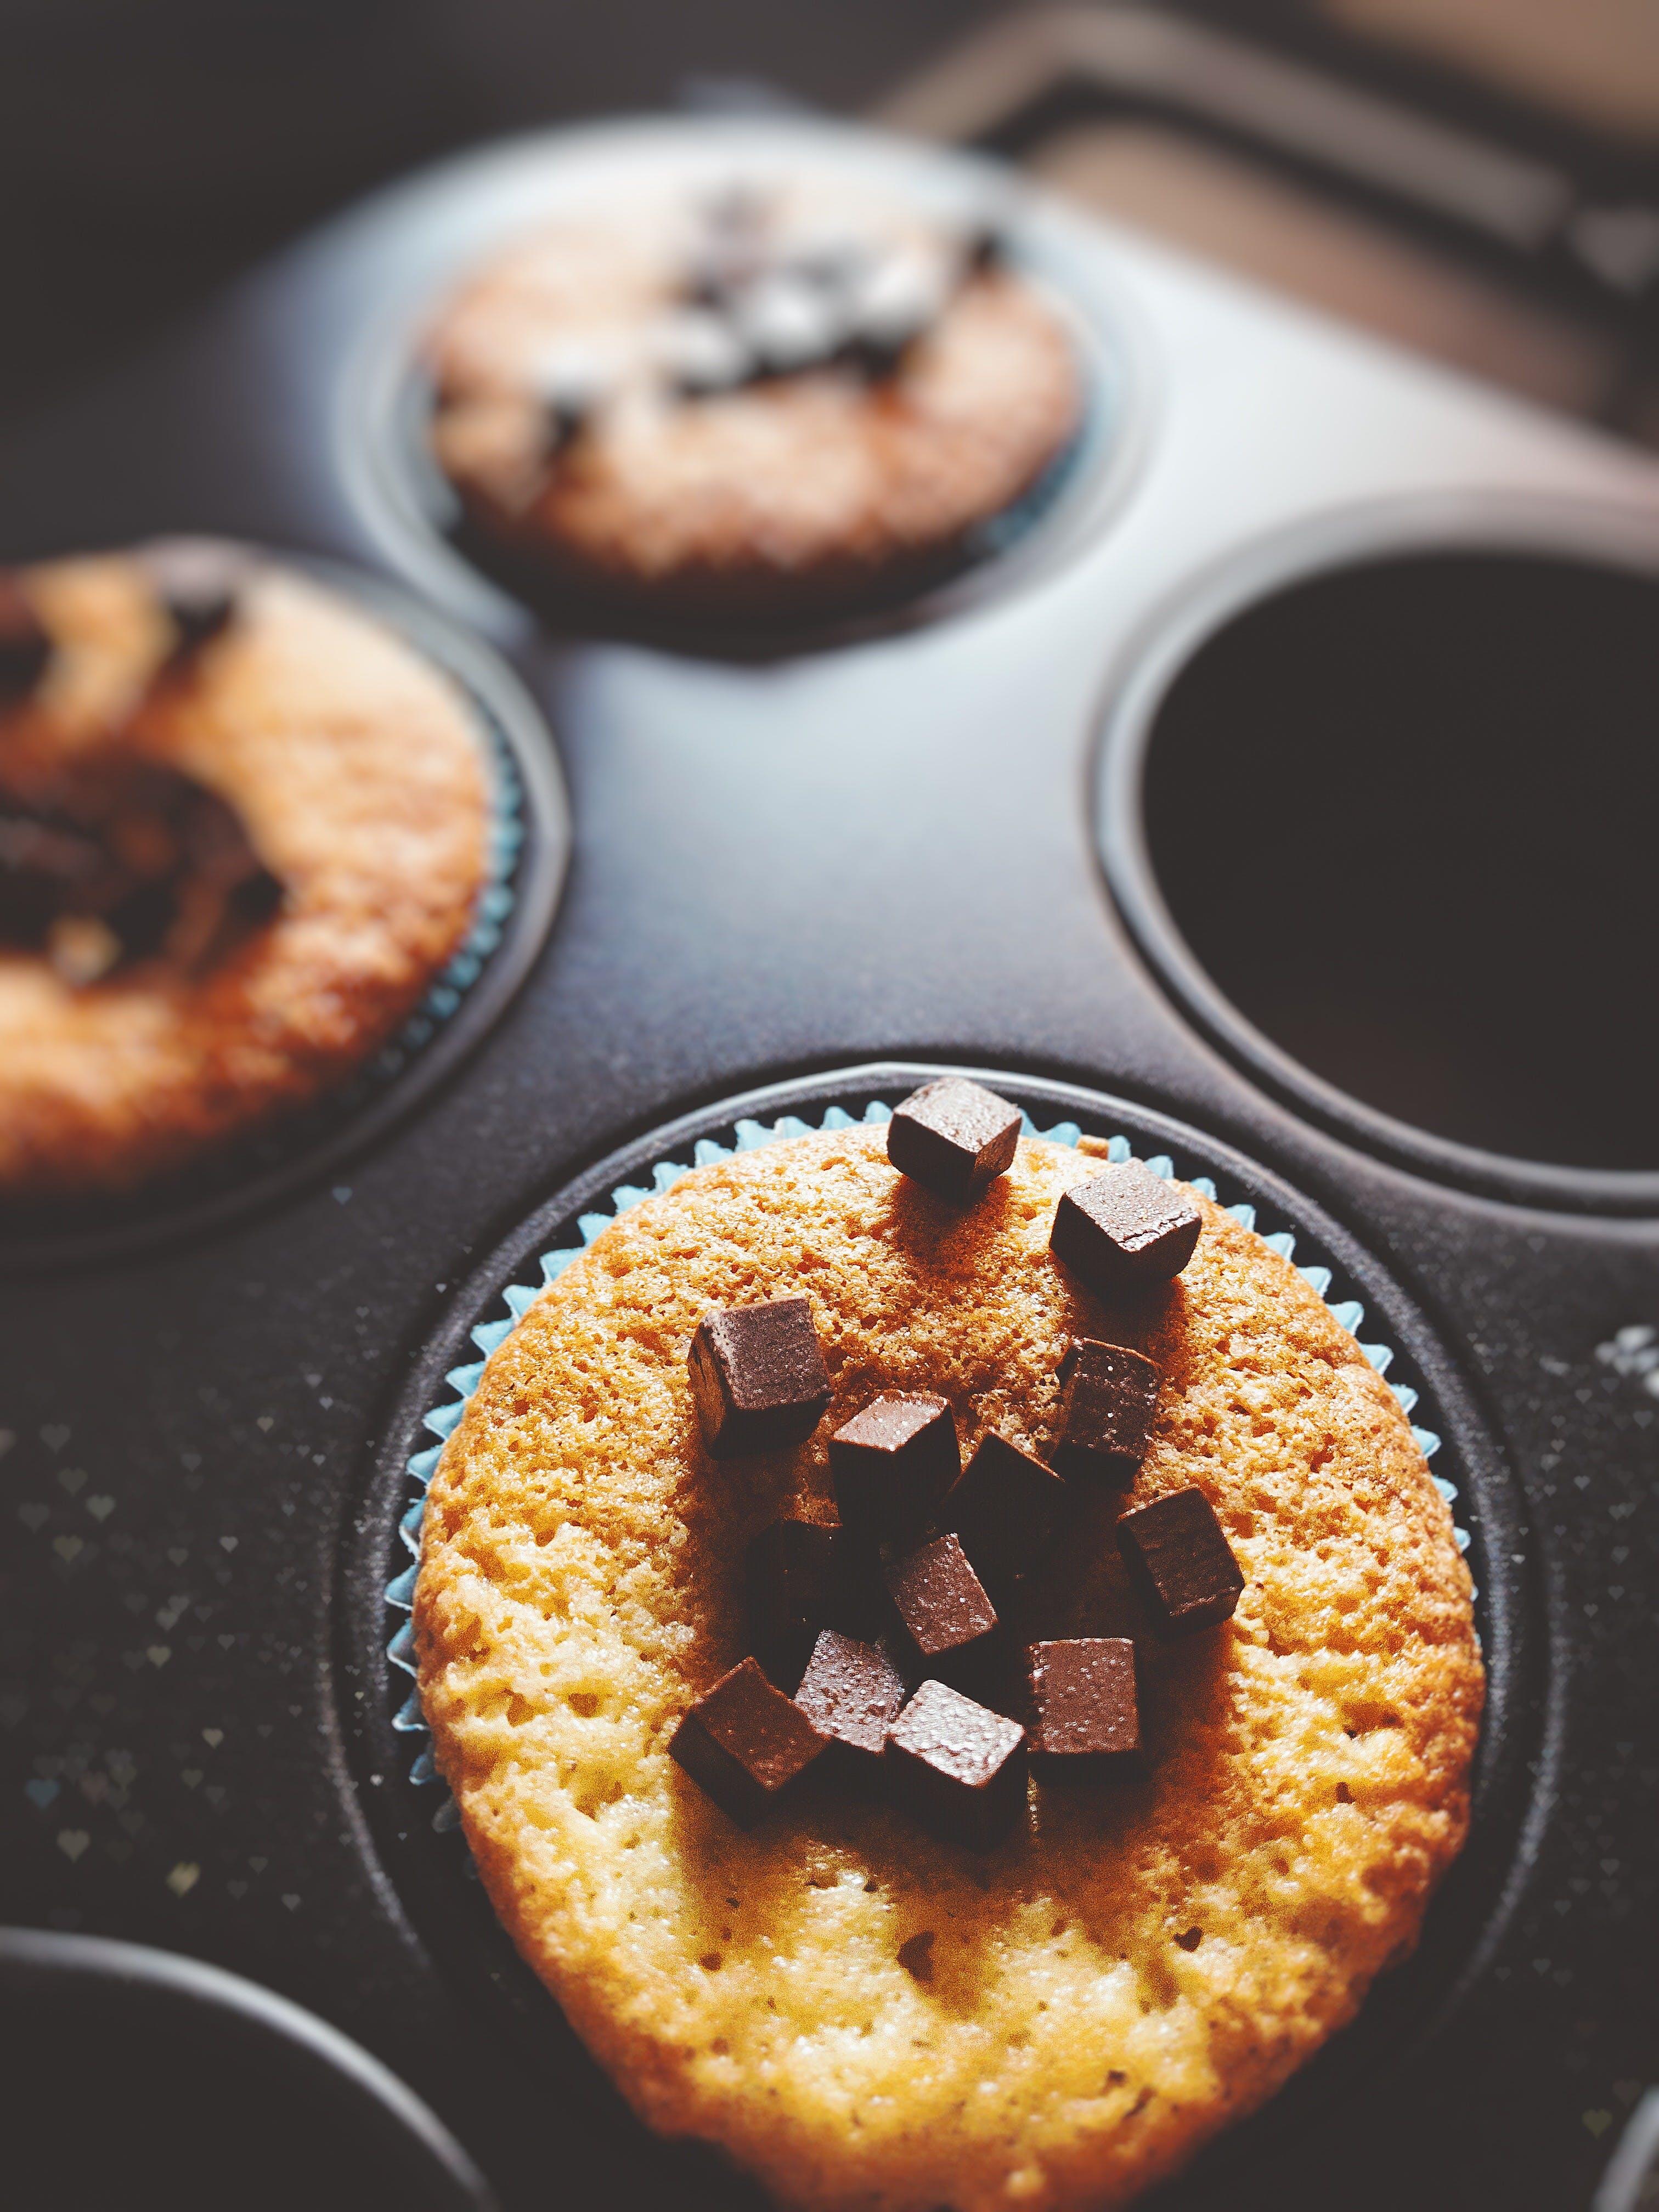 Cupcake With Chocolate Chunks on Top